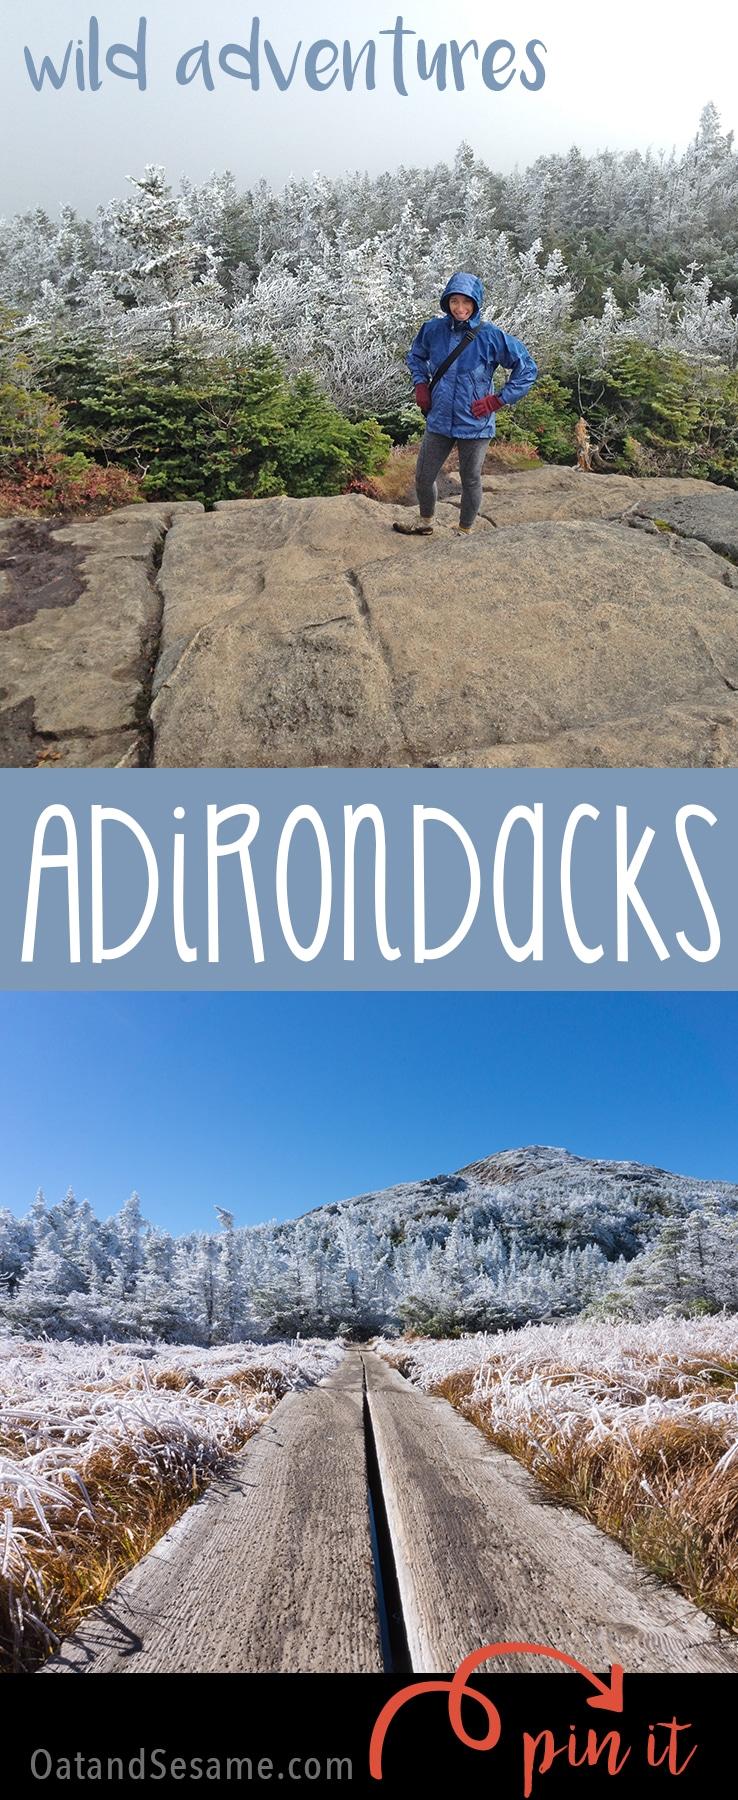 Amazing Apple Picking and Hiking Adventures in the Adirondacks, Upstate New York | OatandSesame.com